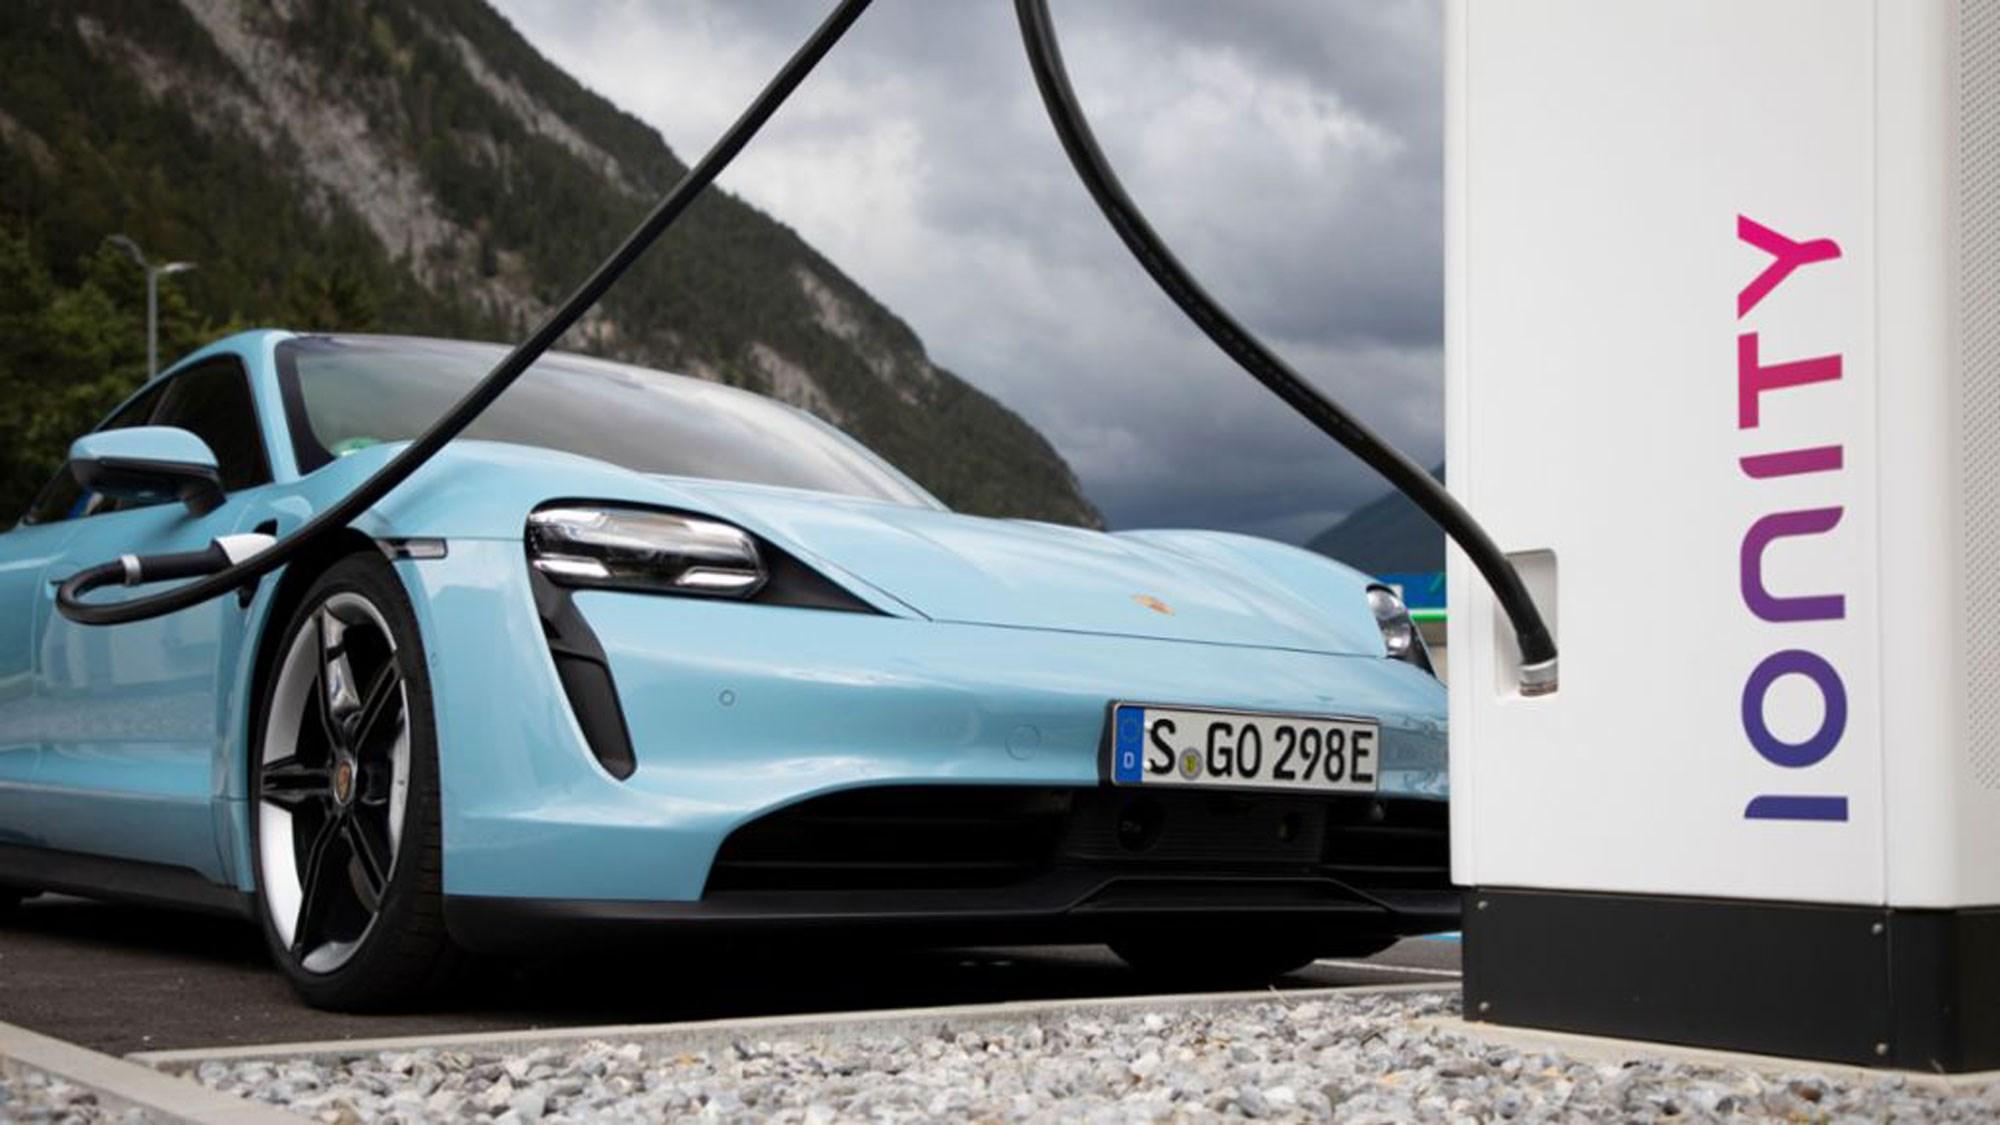 Porsche Taycan Entry Level Ev Starts At 70k Car Magazine